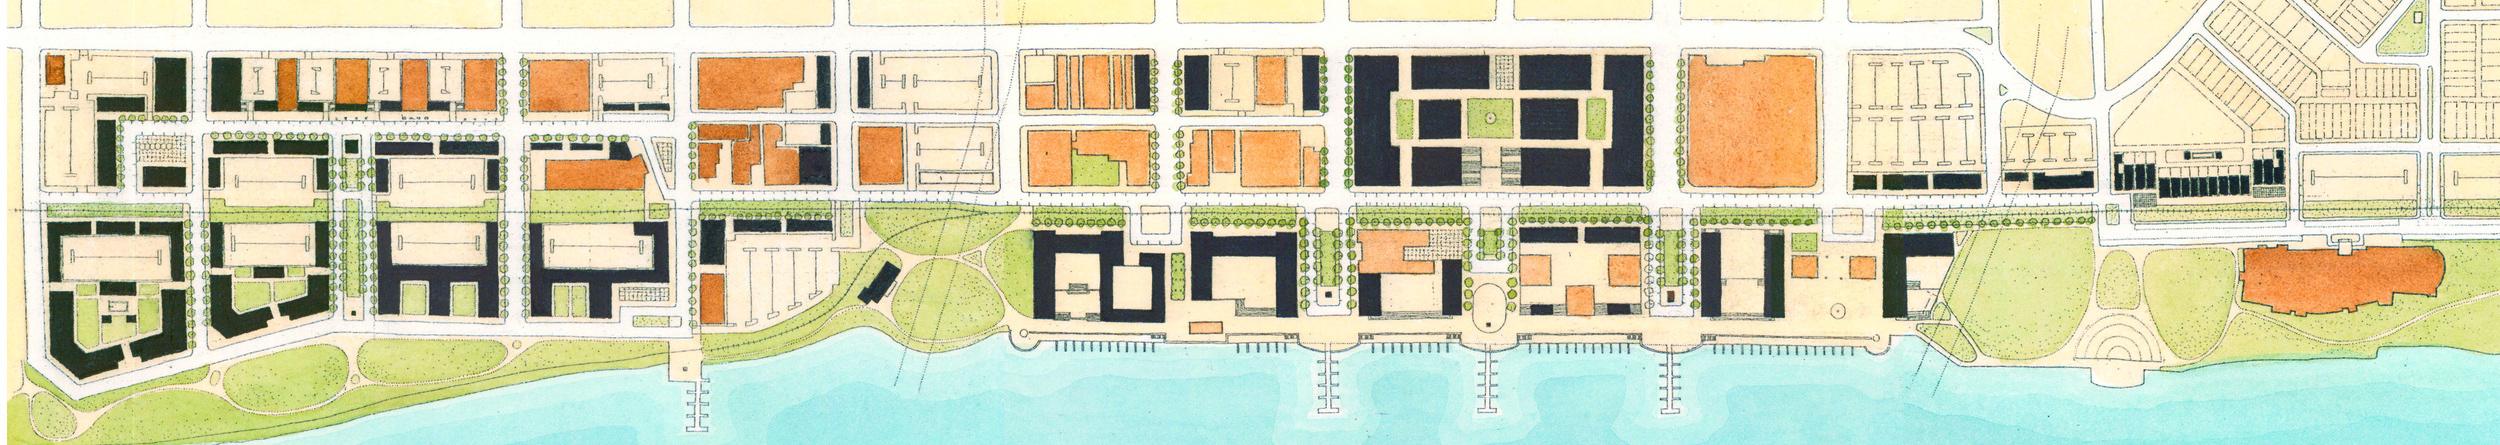 Heart of Peoria plan detail